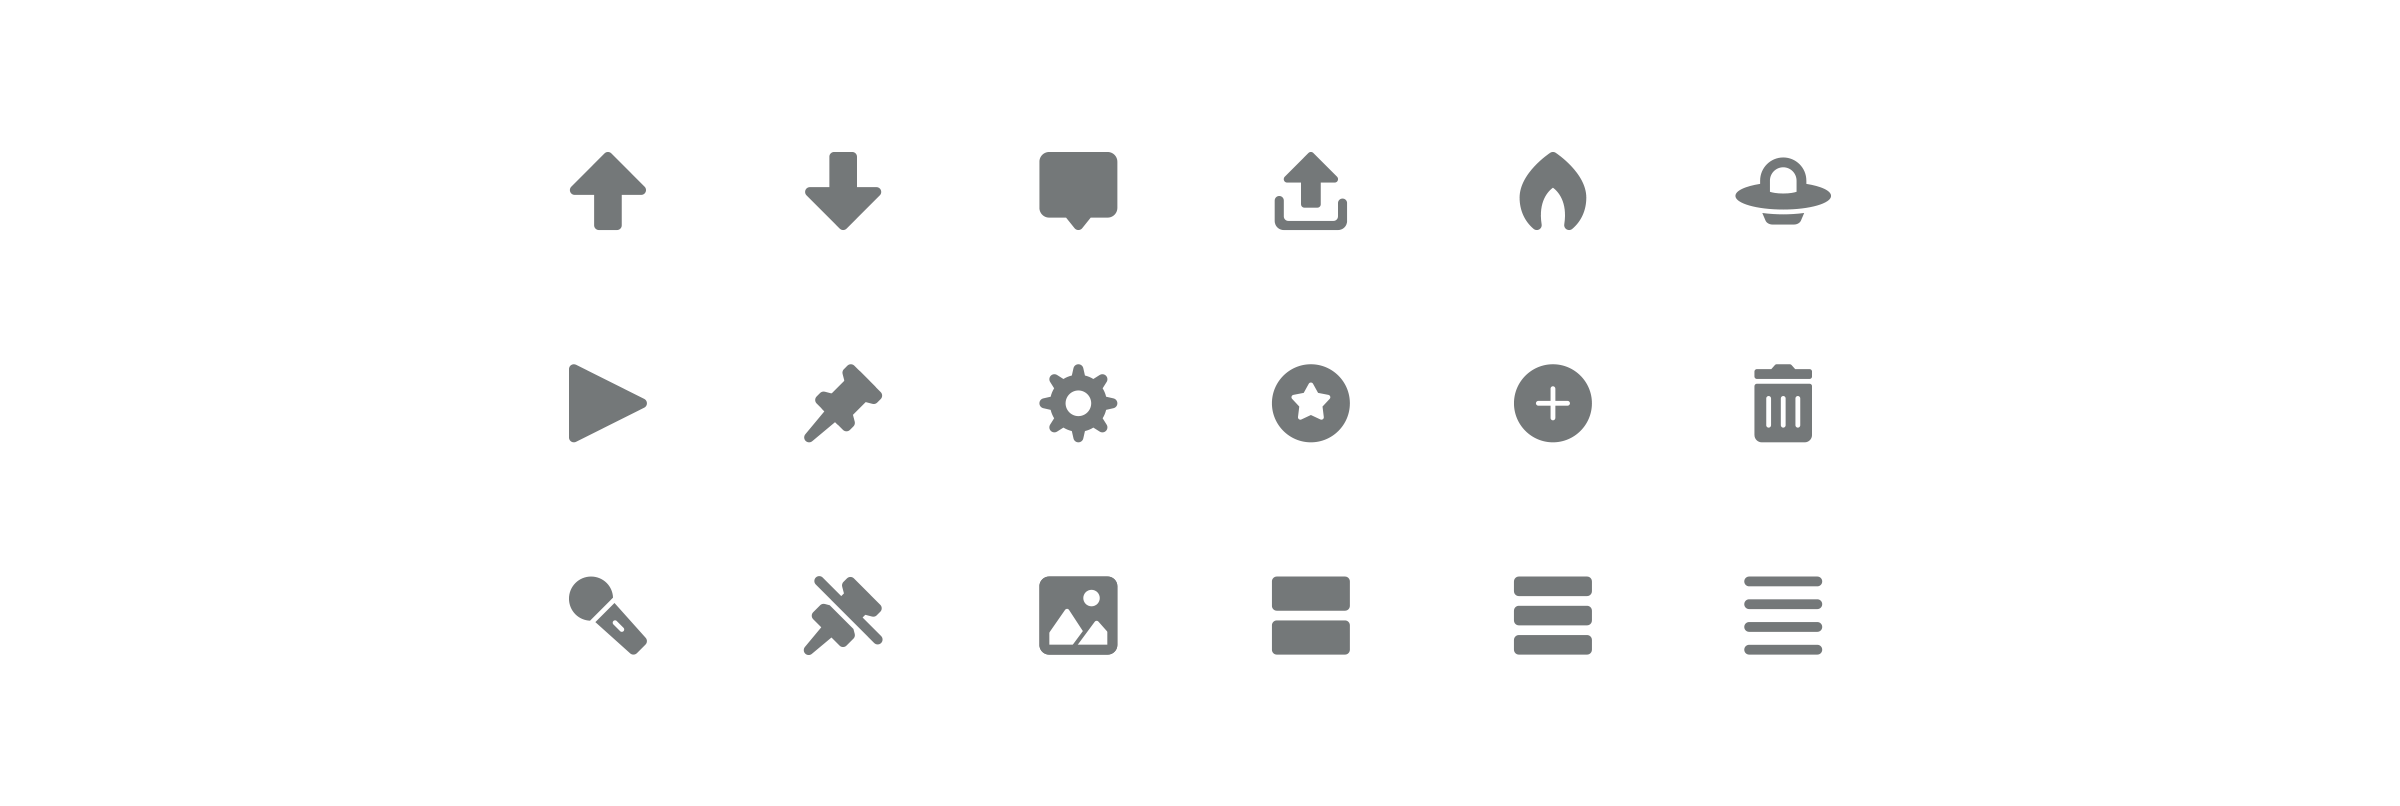 Primary_Icons_Reddit